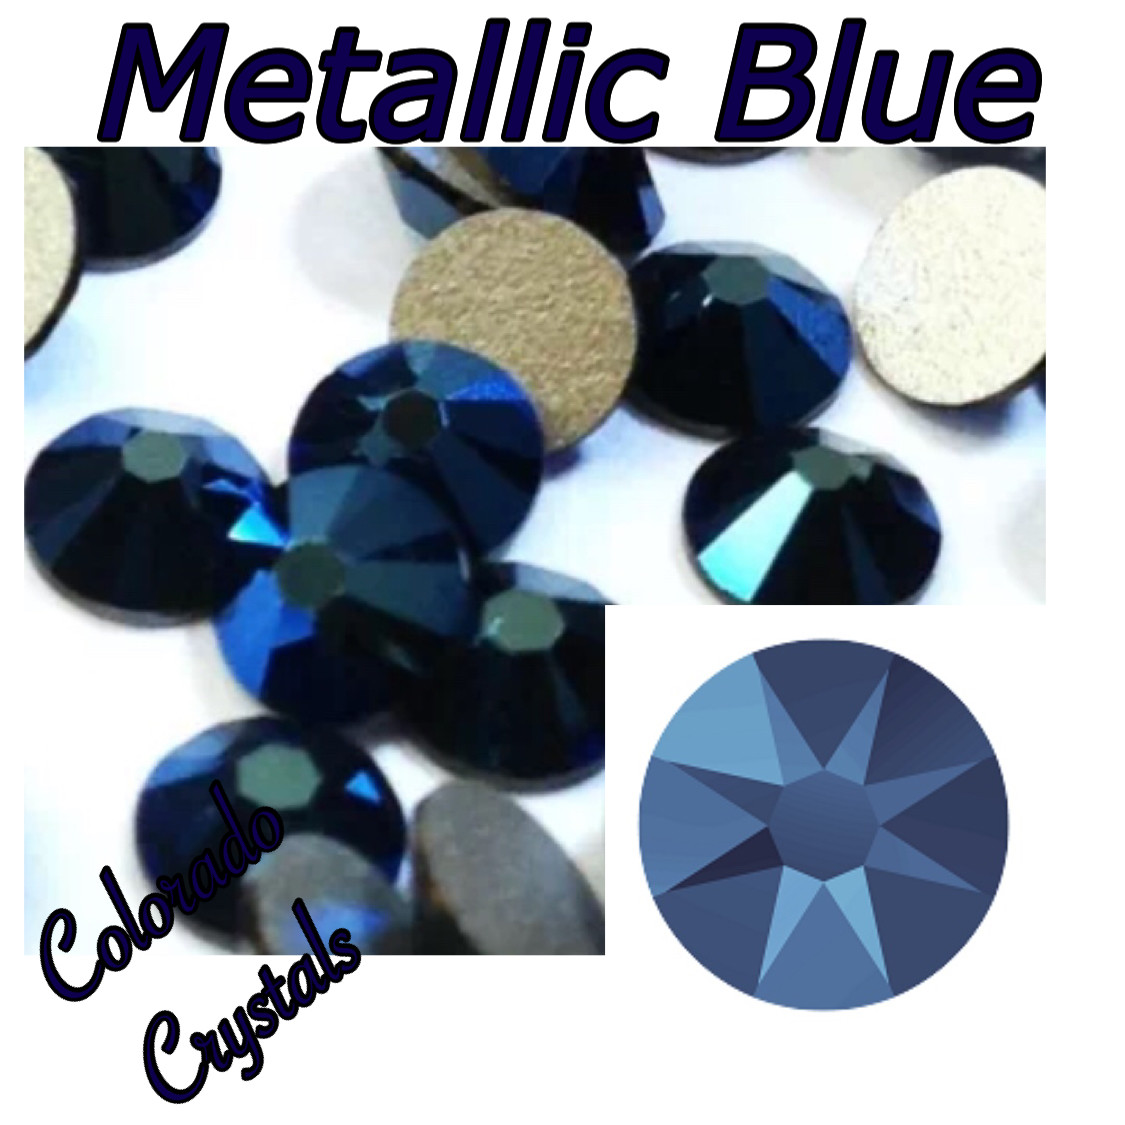 Metallic Blue (Crystal) 7ss 2058